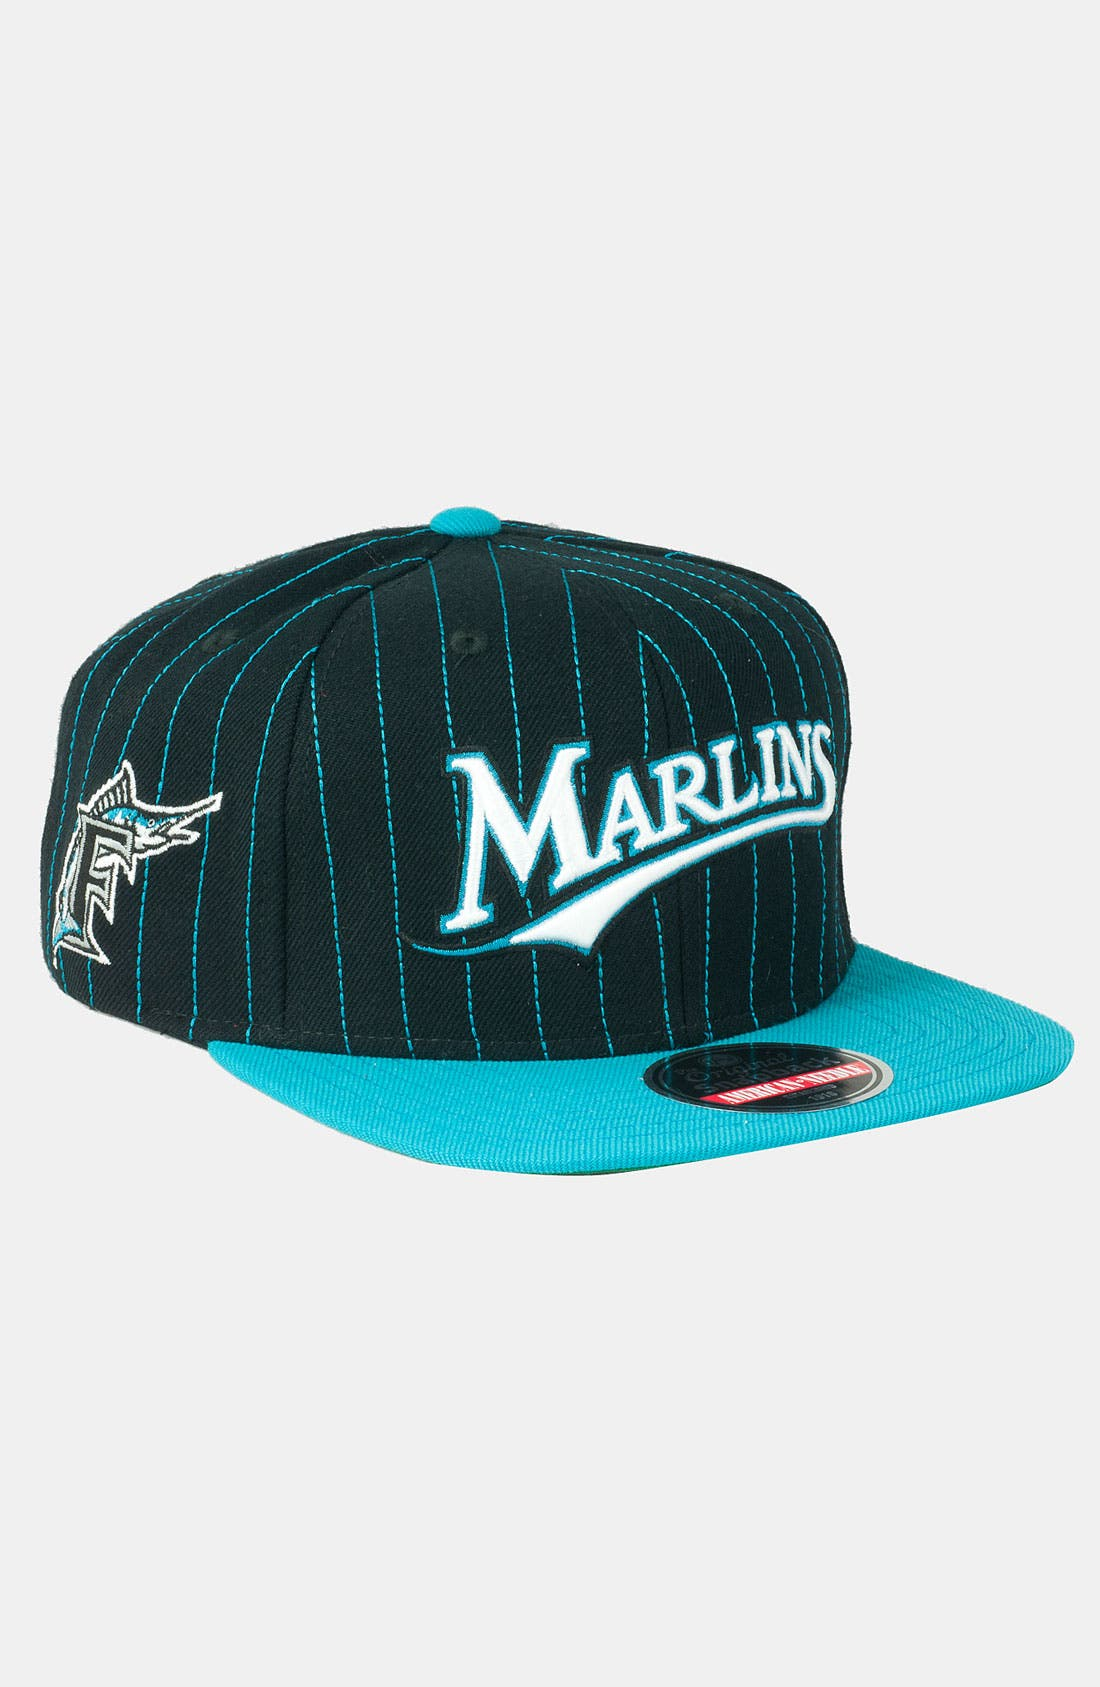 Main Image - American Needle 'Marlins' Snapback Baseball Cap